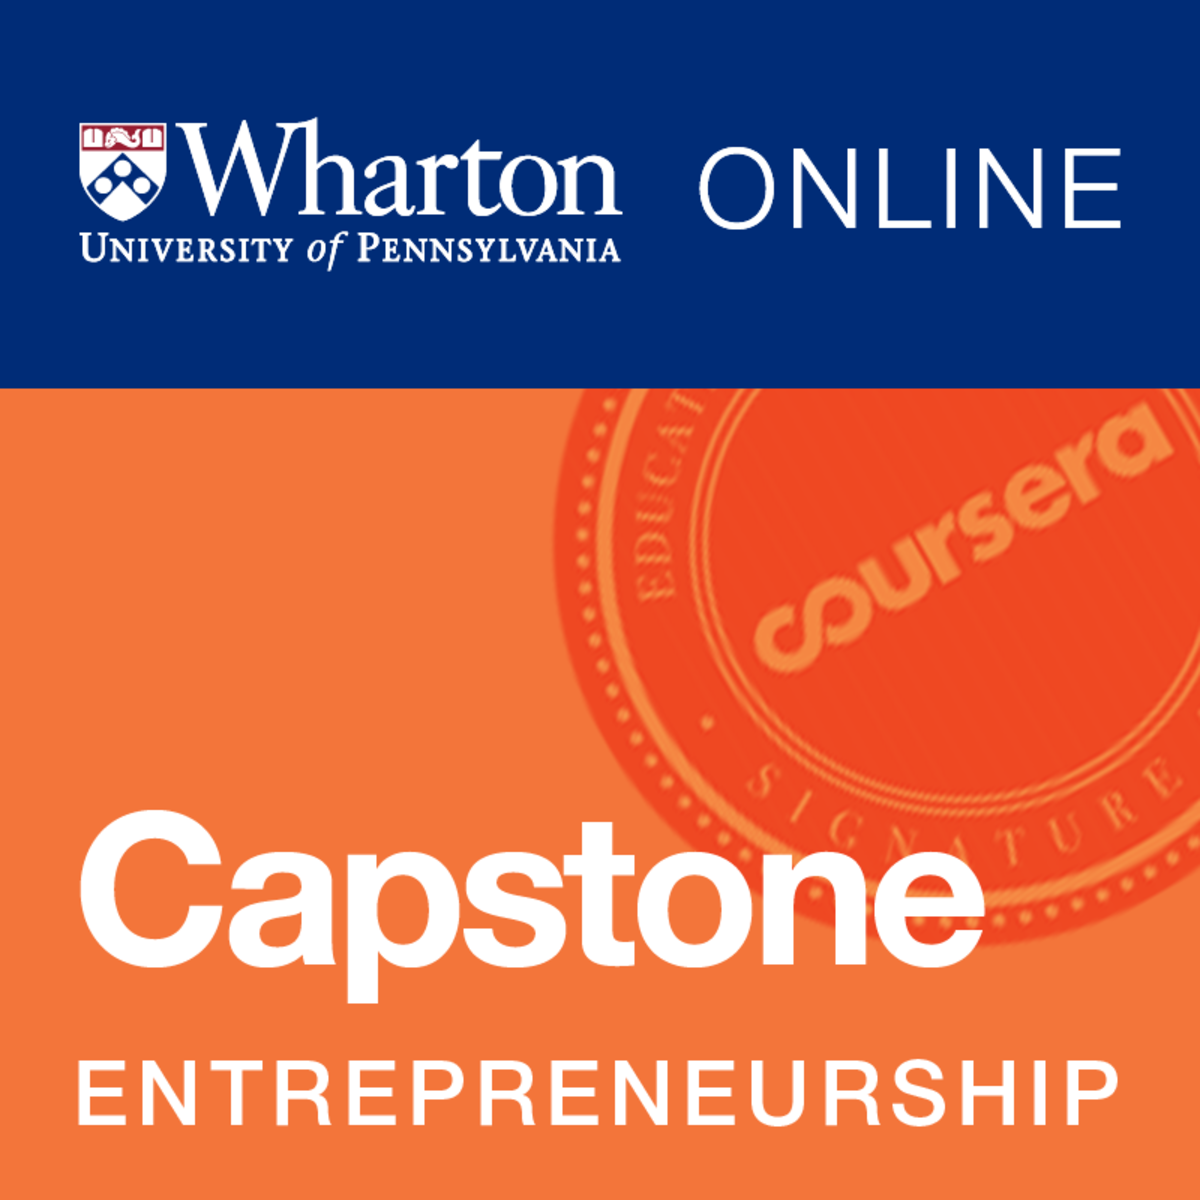 coursera capstone project quiz 2